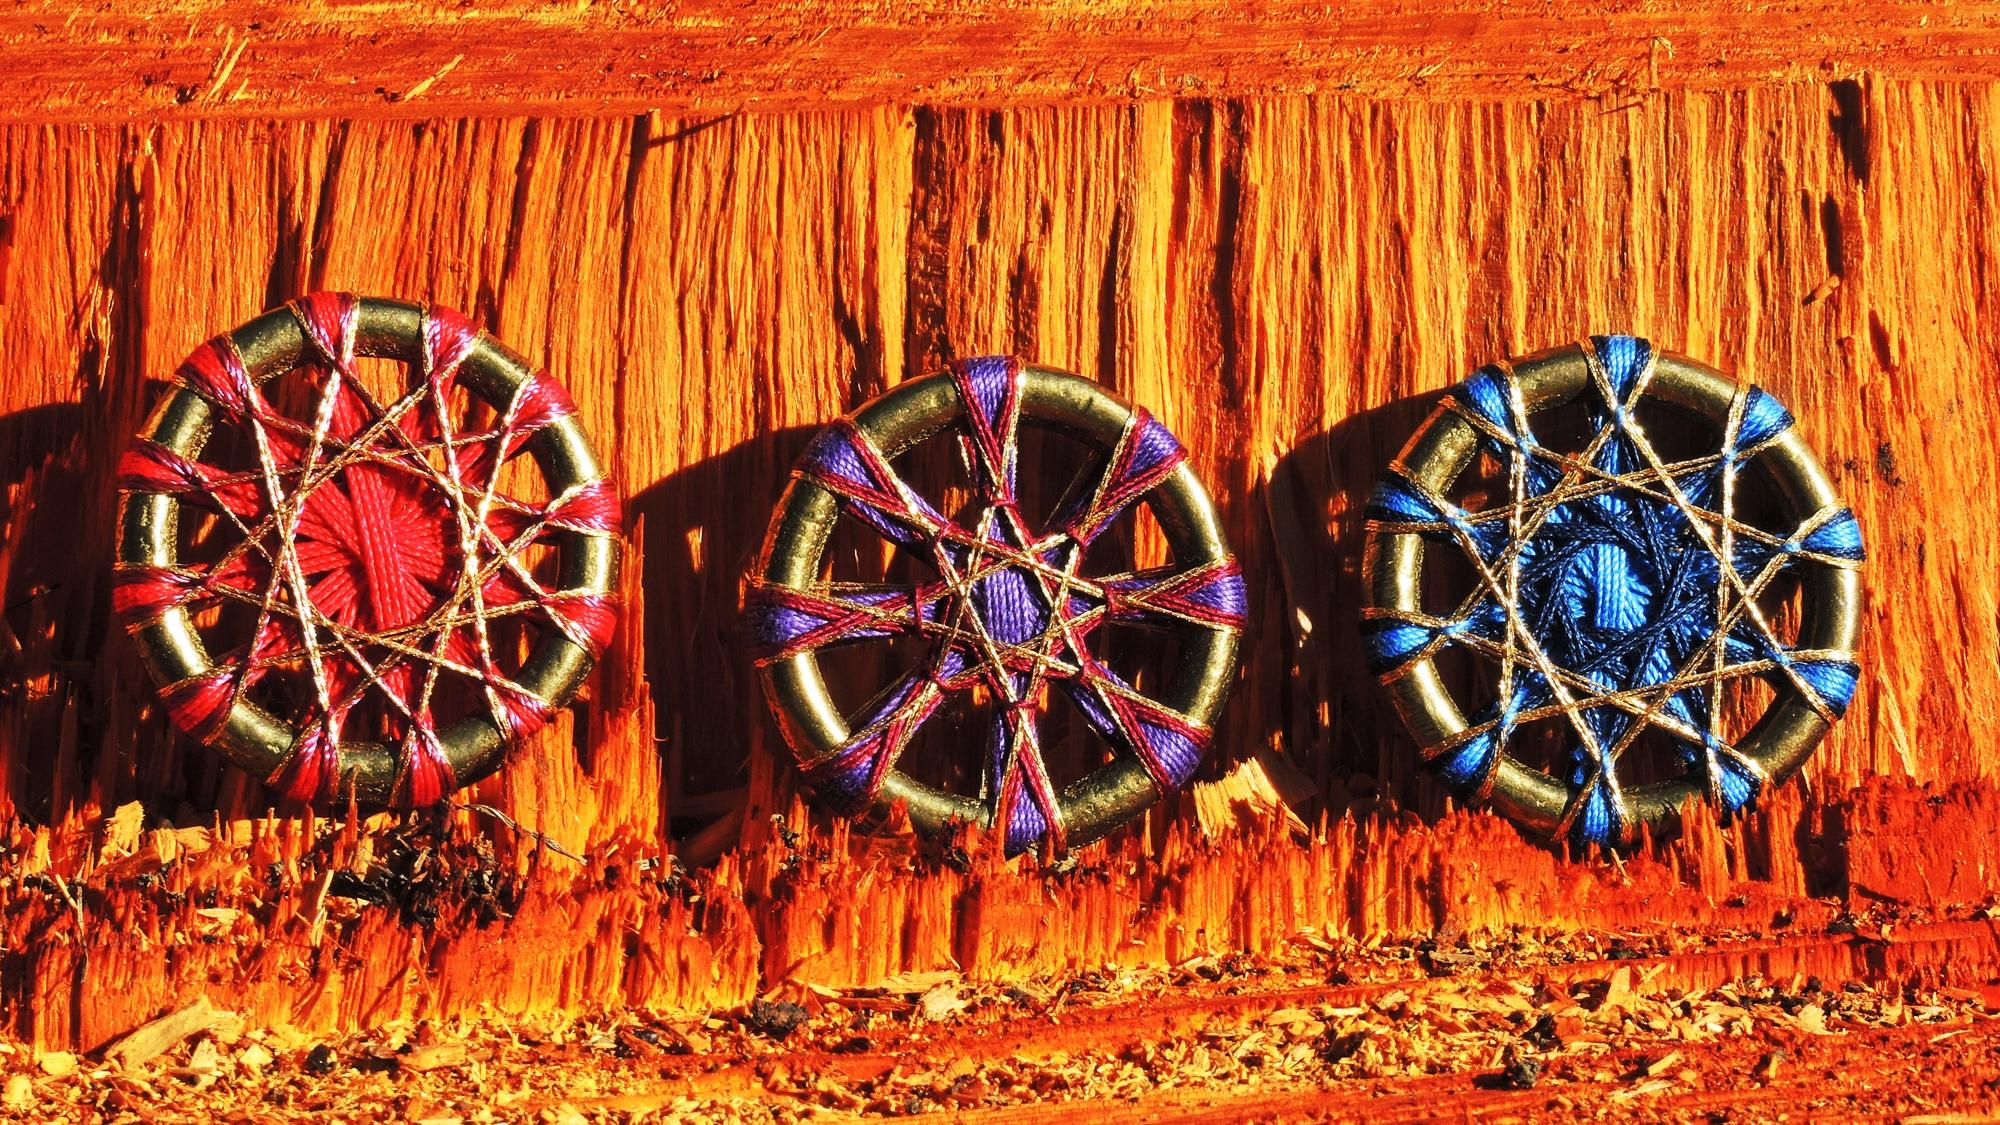 Nr. 20  3 Zwirnknopf-Anhänger   Ø  45 mm, Dicke 5 mm   Material: Baumwolle, Messing, Goldgarn